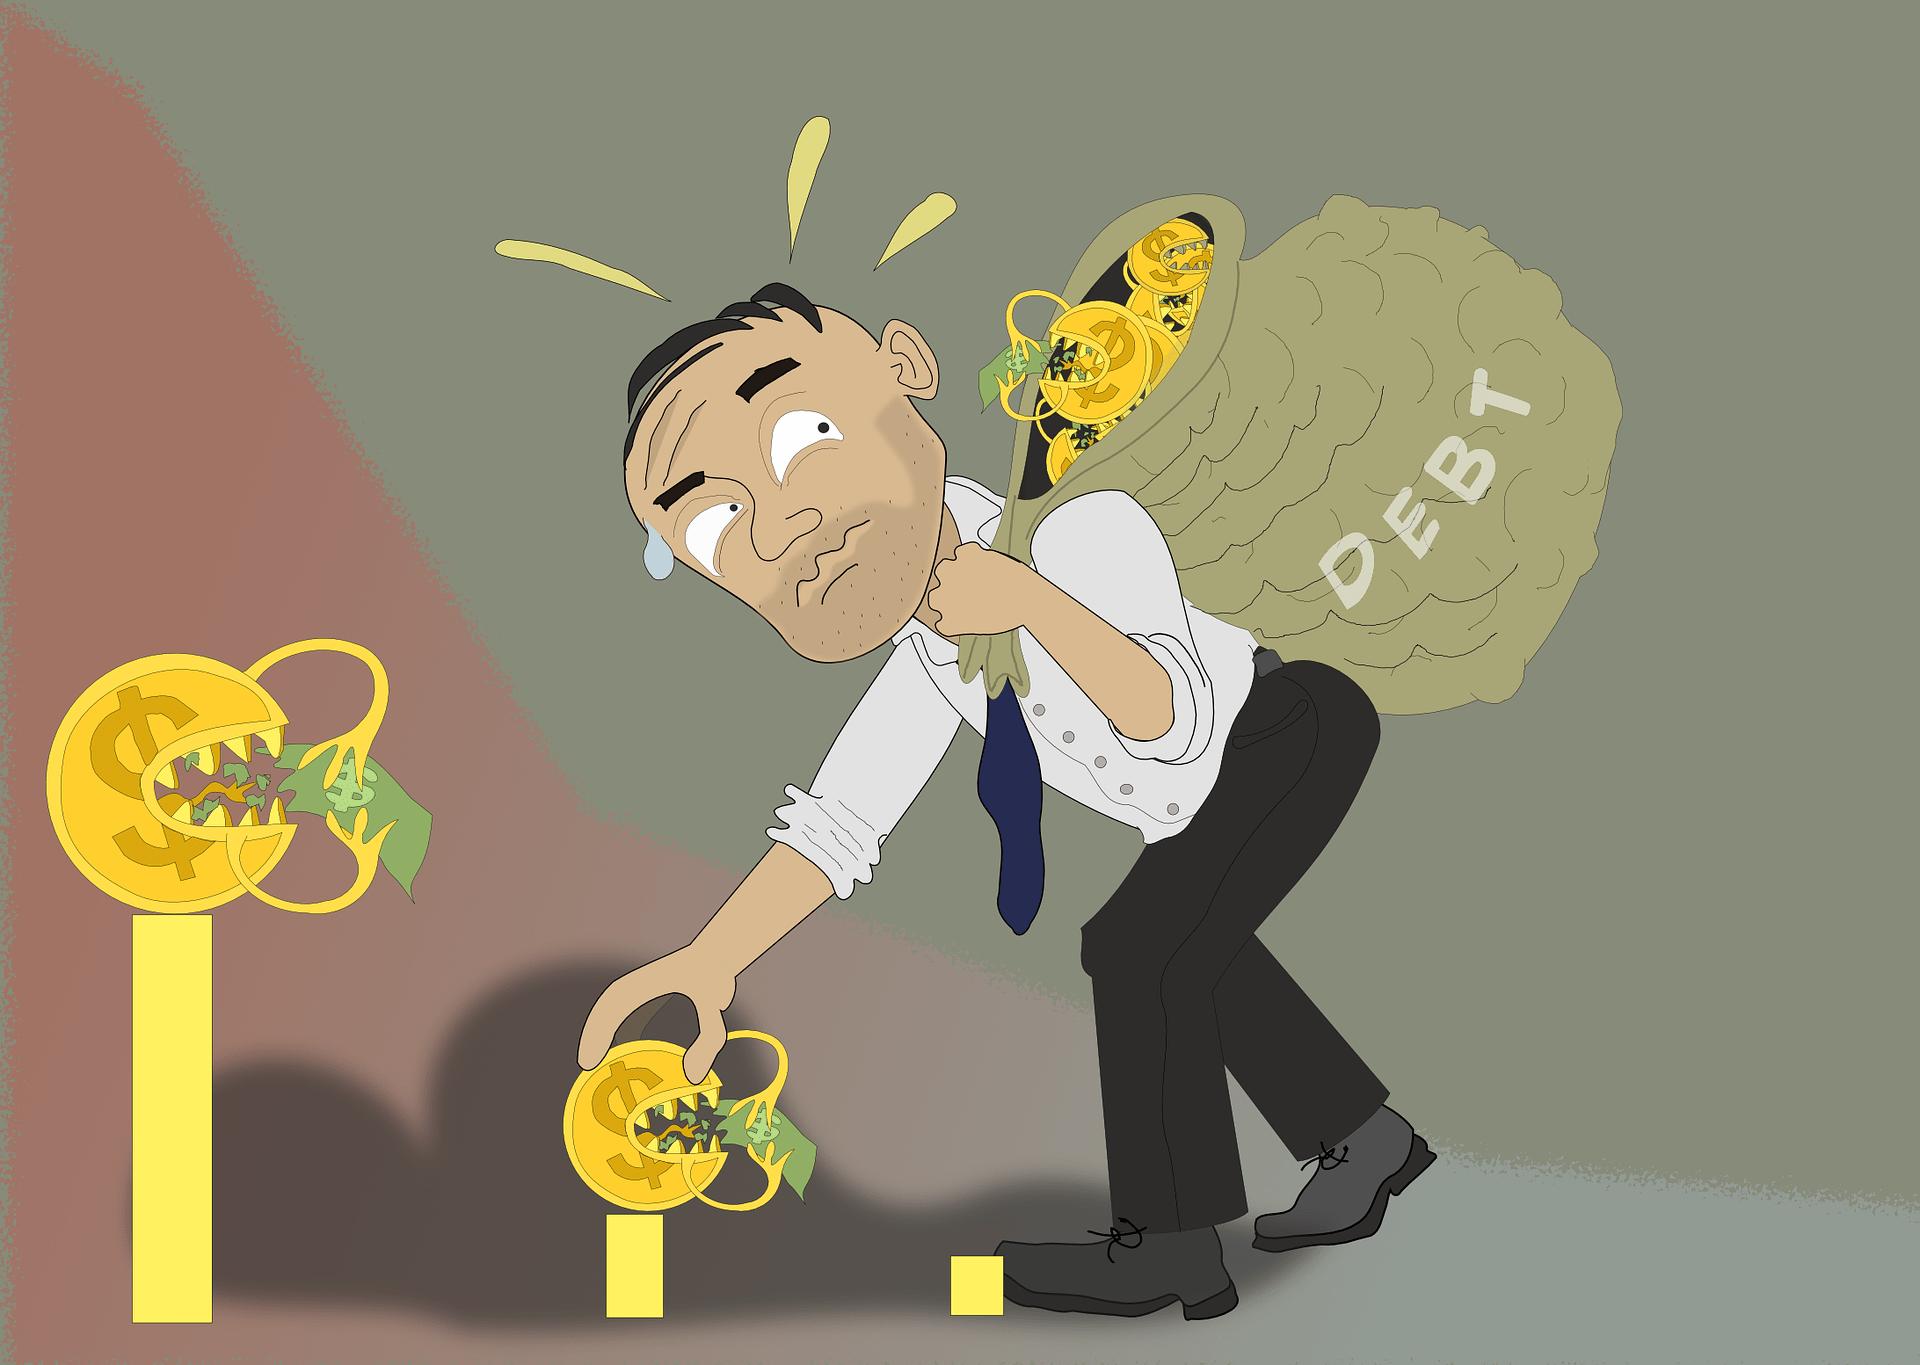 sospensione mututi e rate